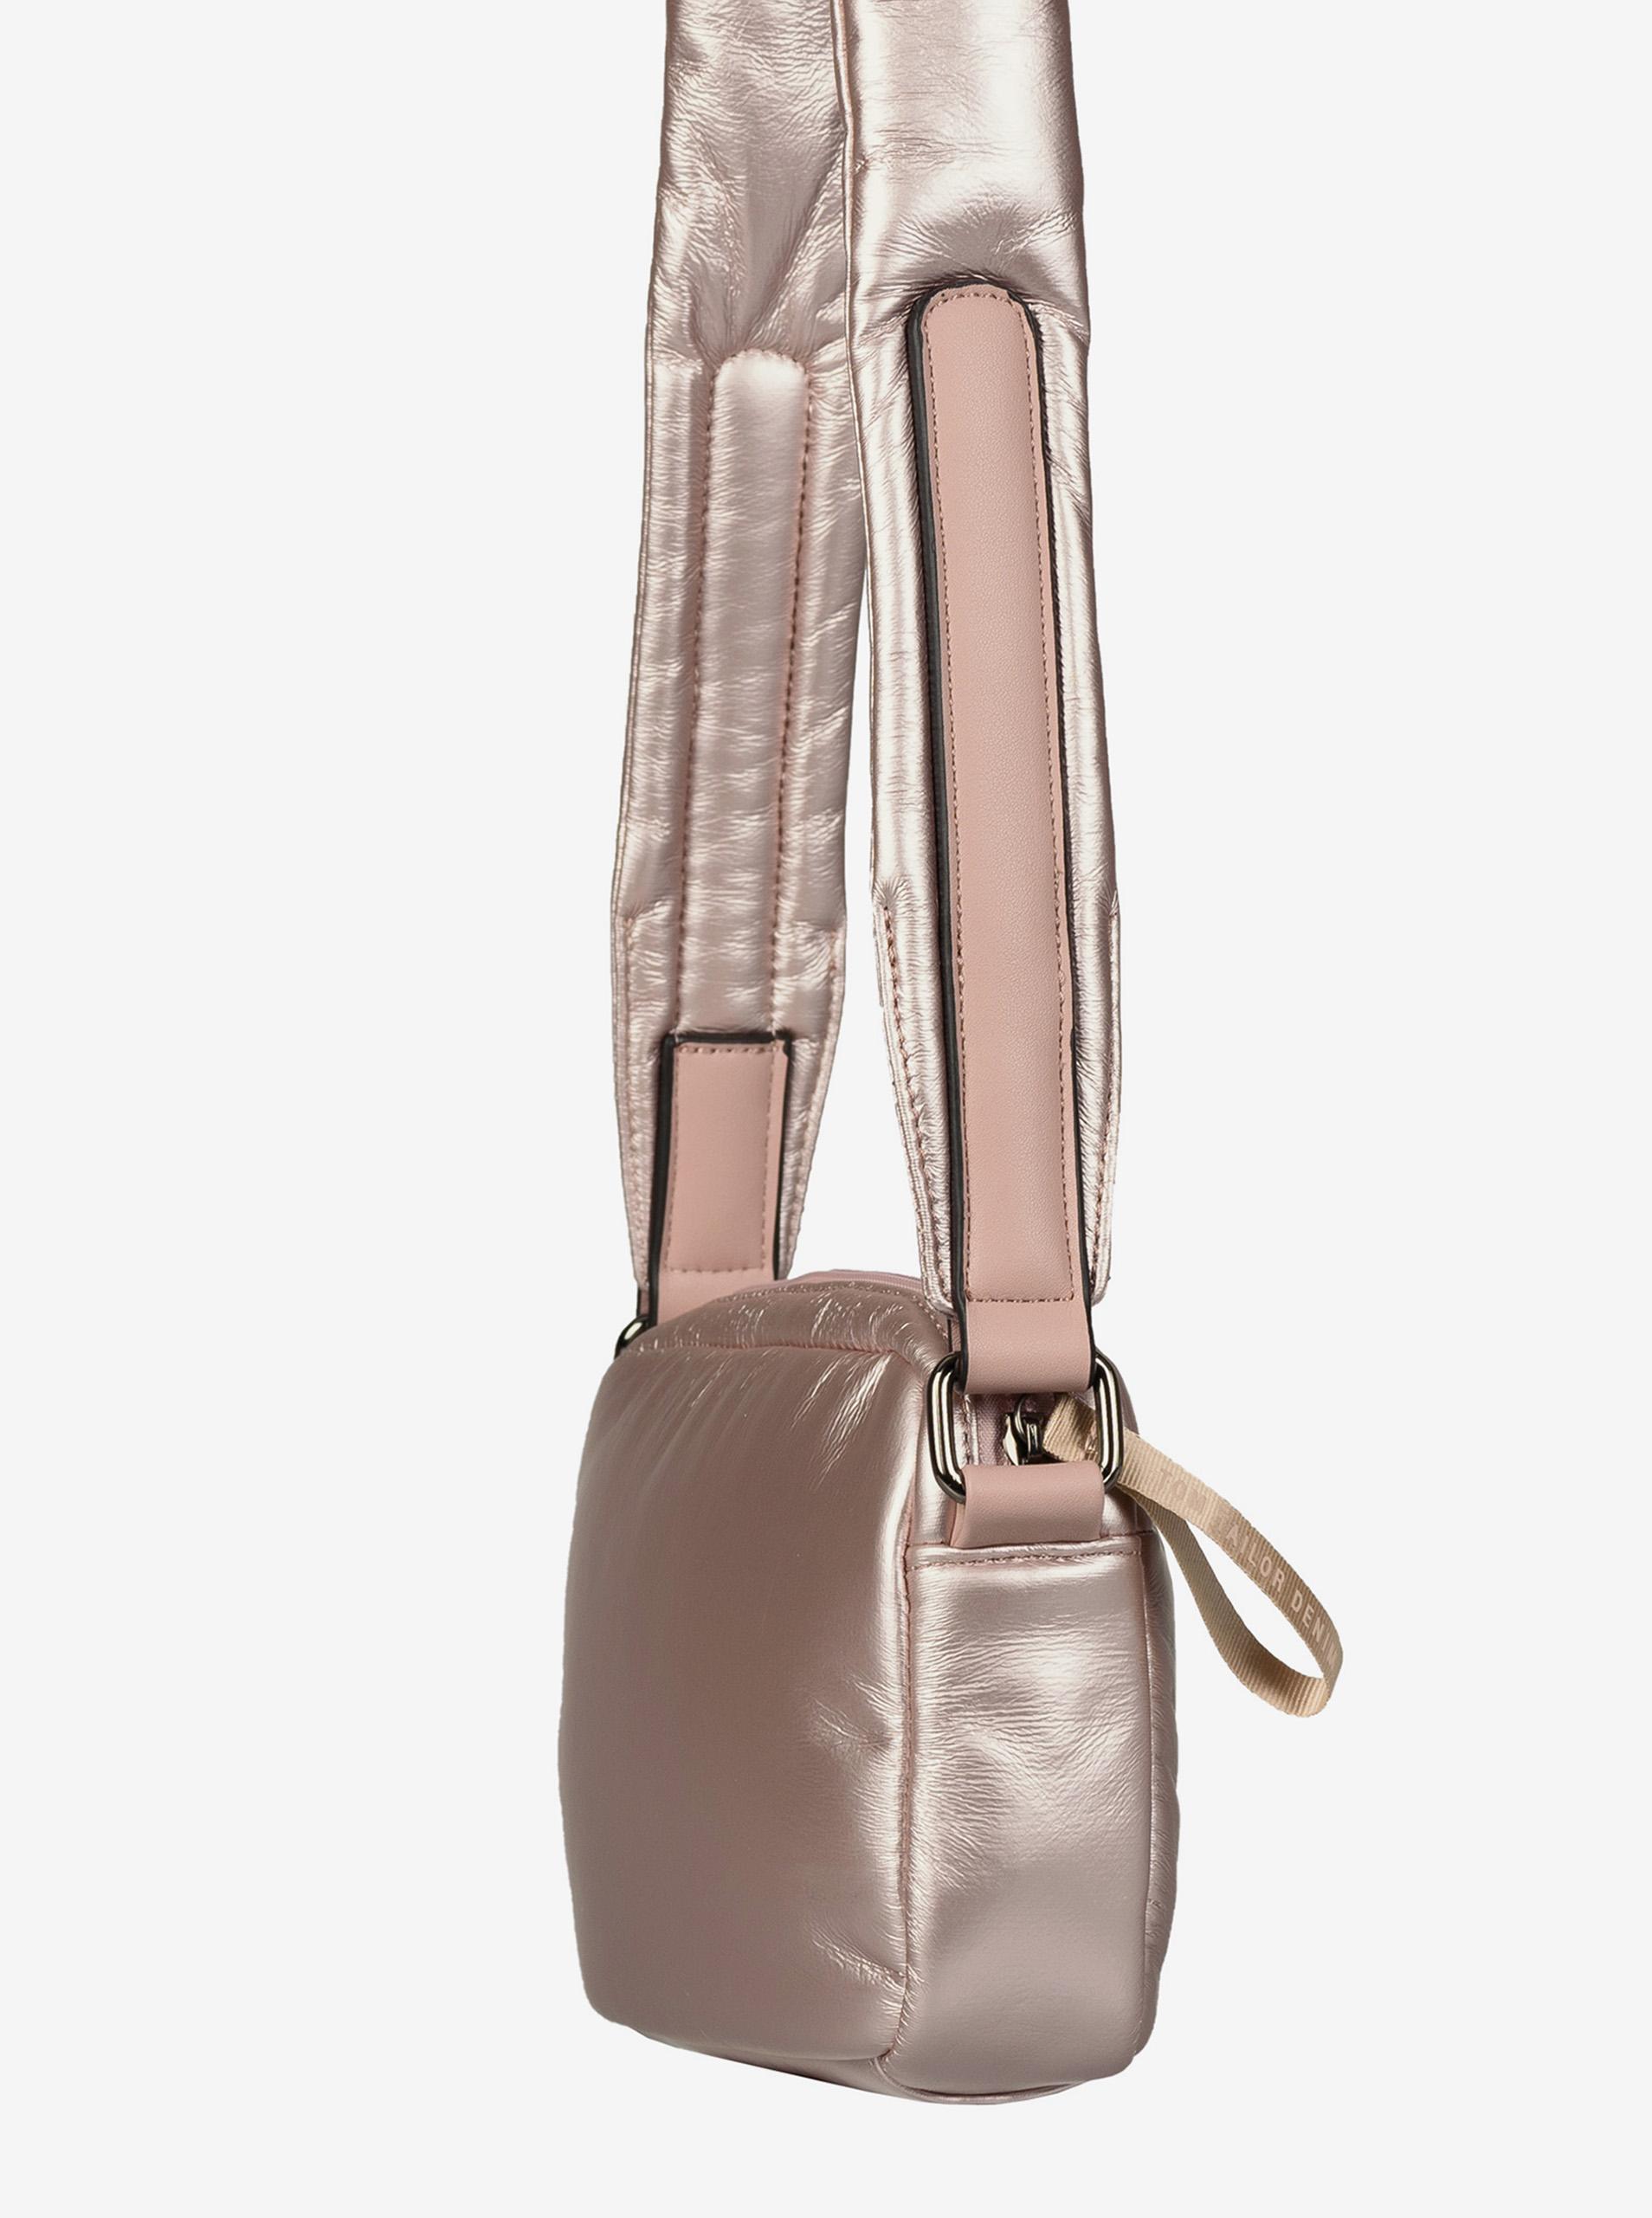 Rosa donna metallico borsa crossbody Tom Tailor Denim